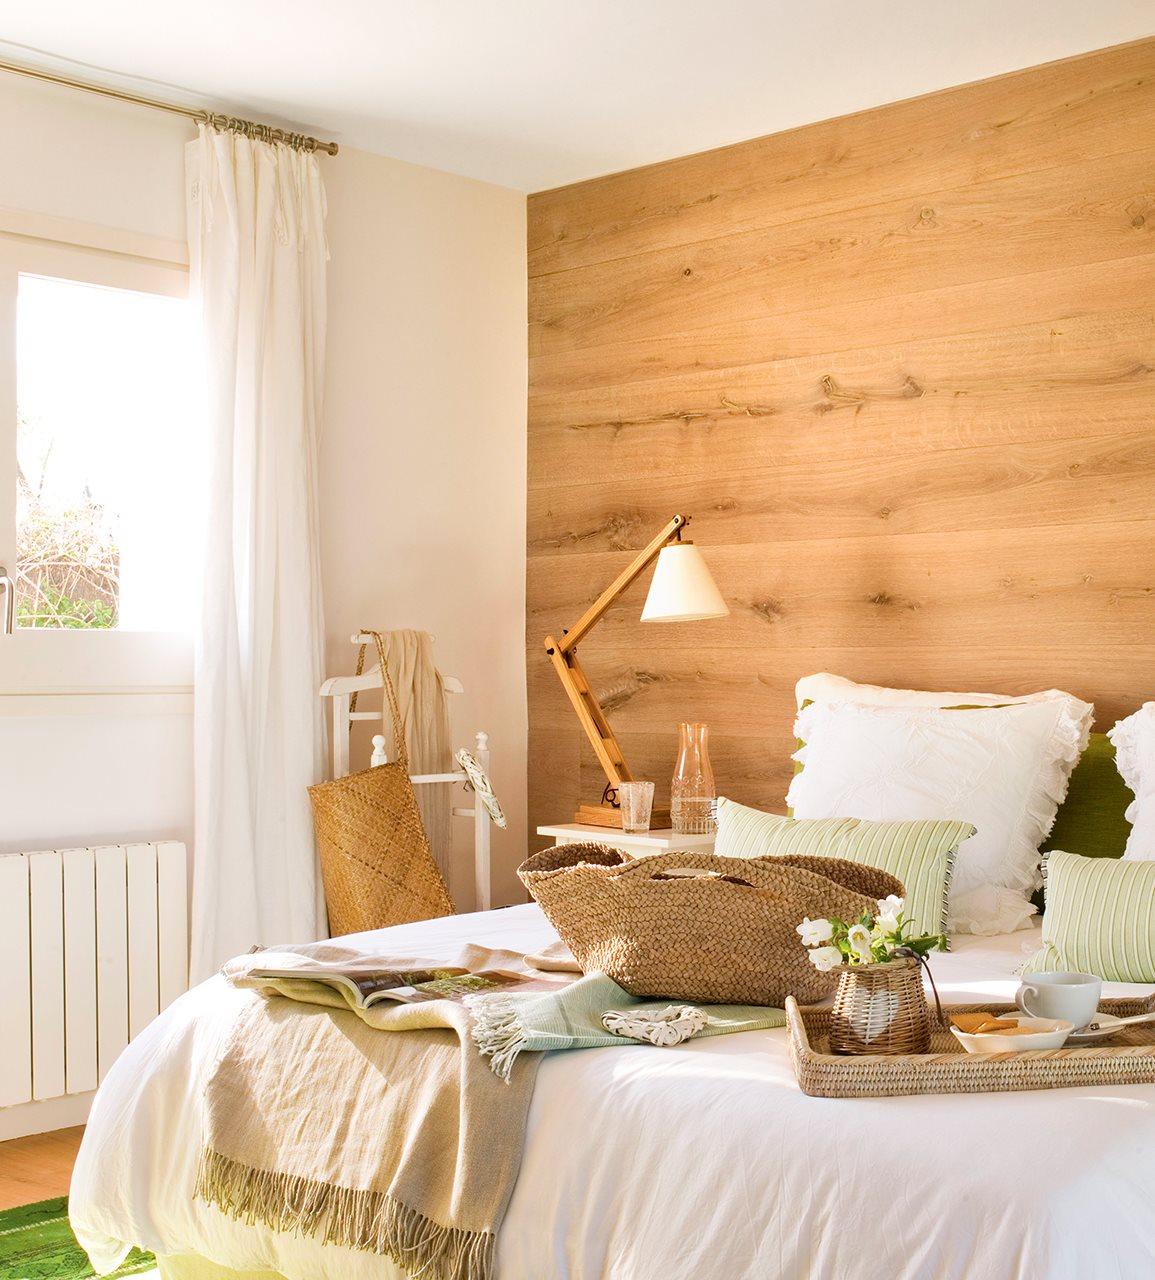 Diez cabeceros distintos adecuados para diferentes necesidades - Cabeceros de cama con fotos ...